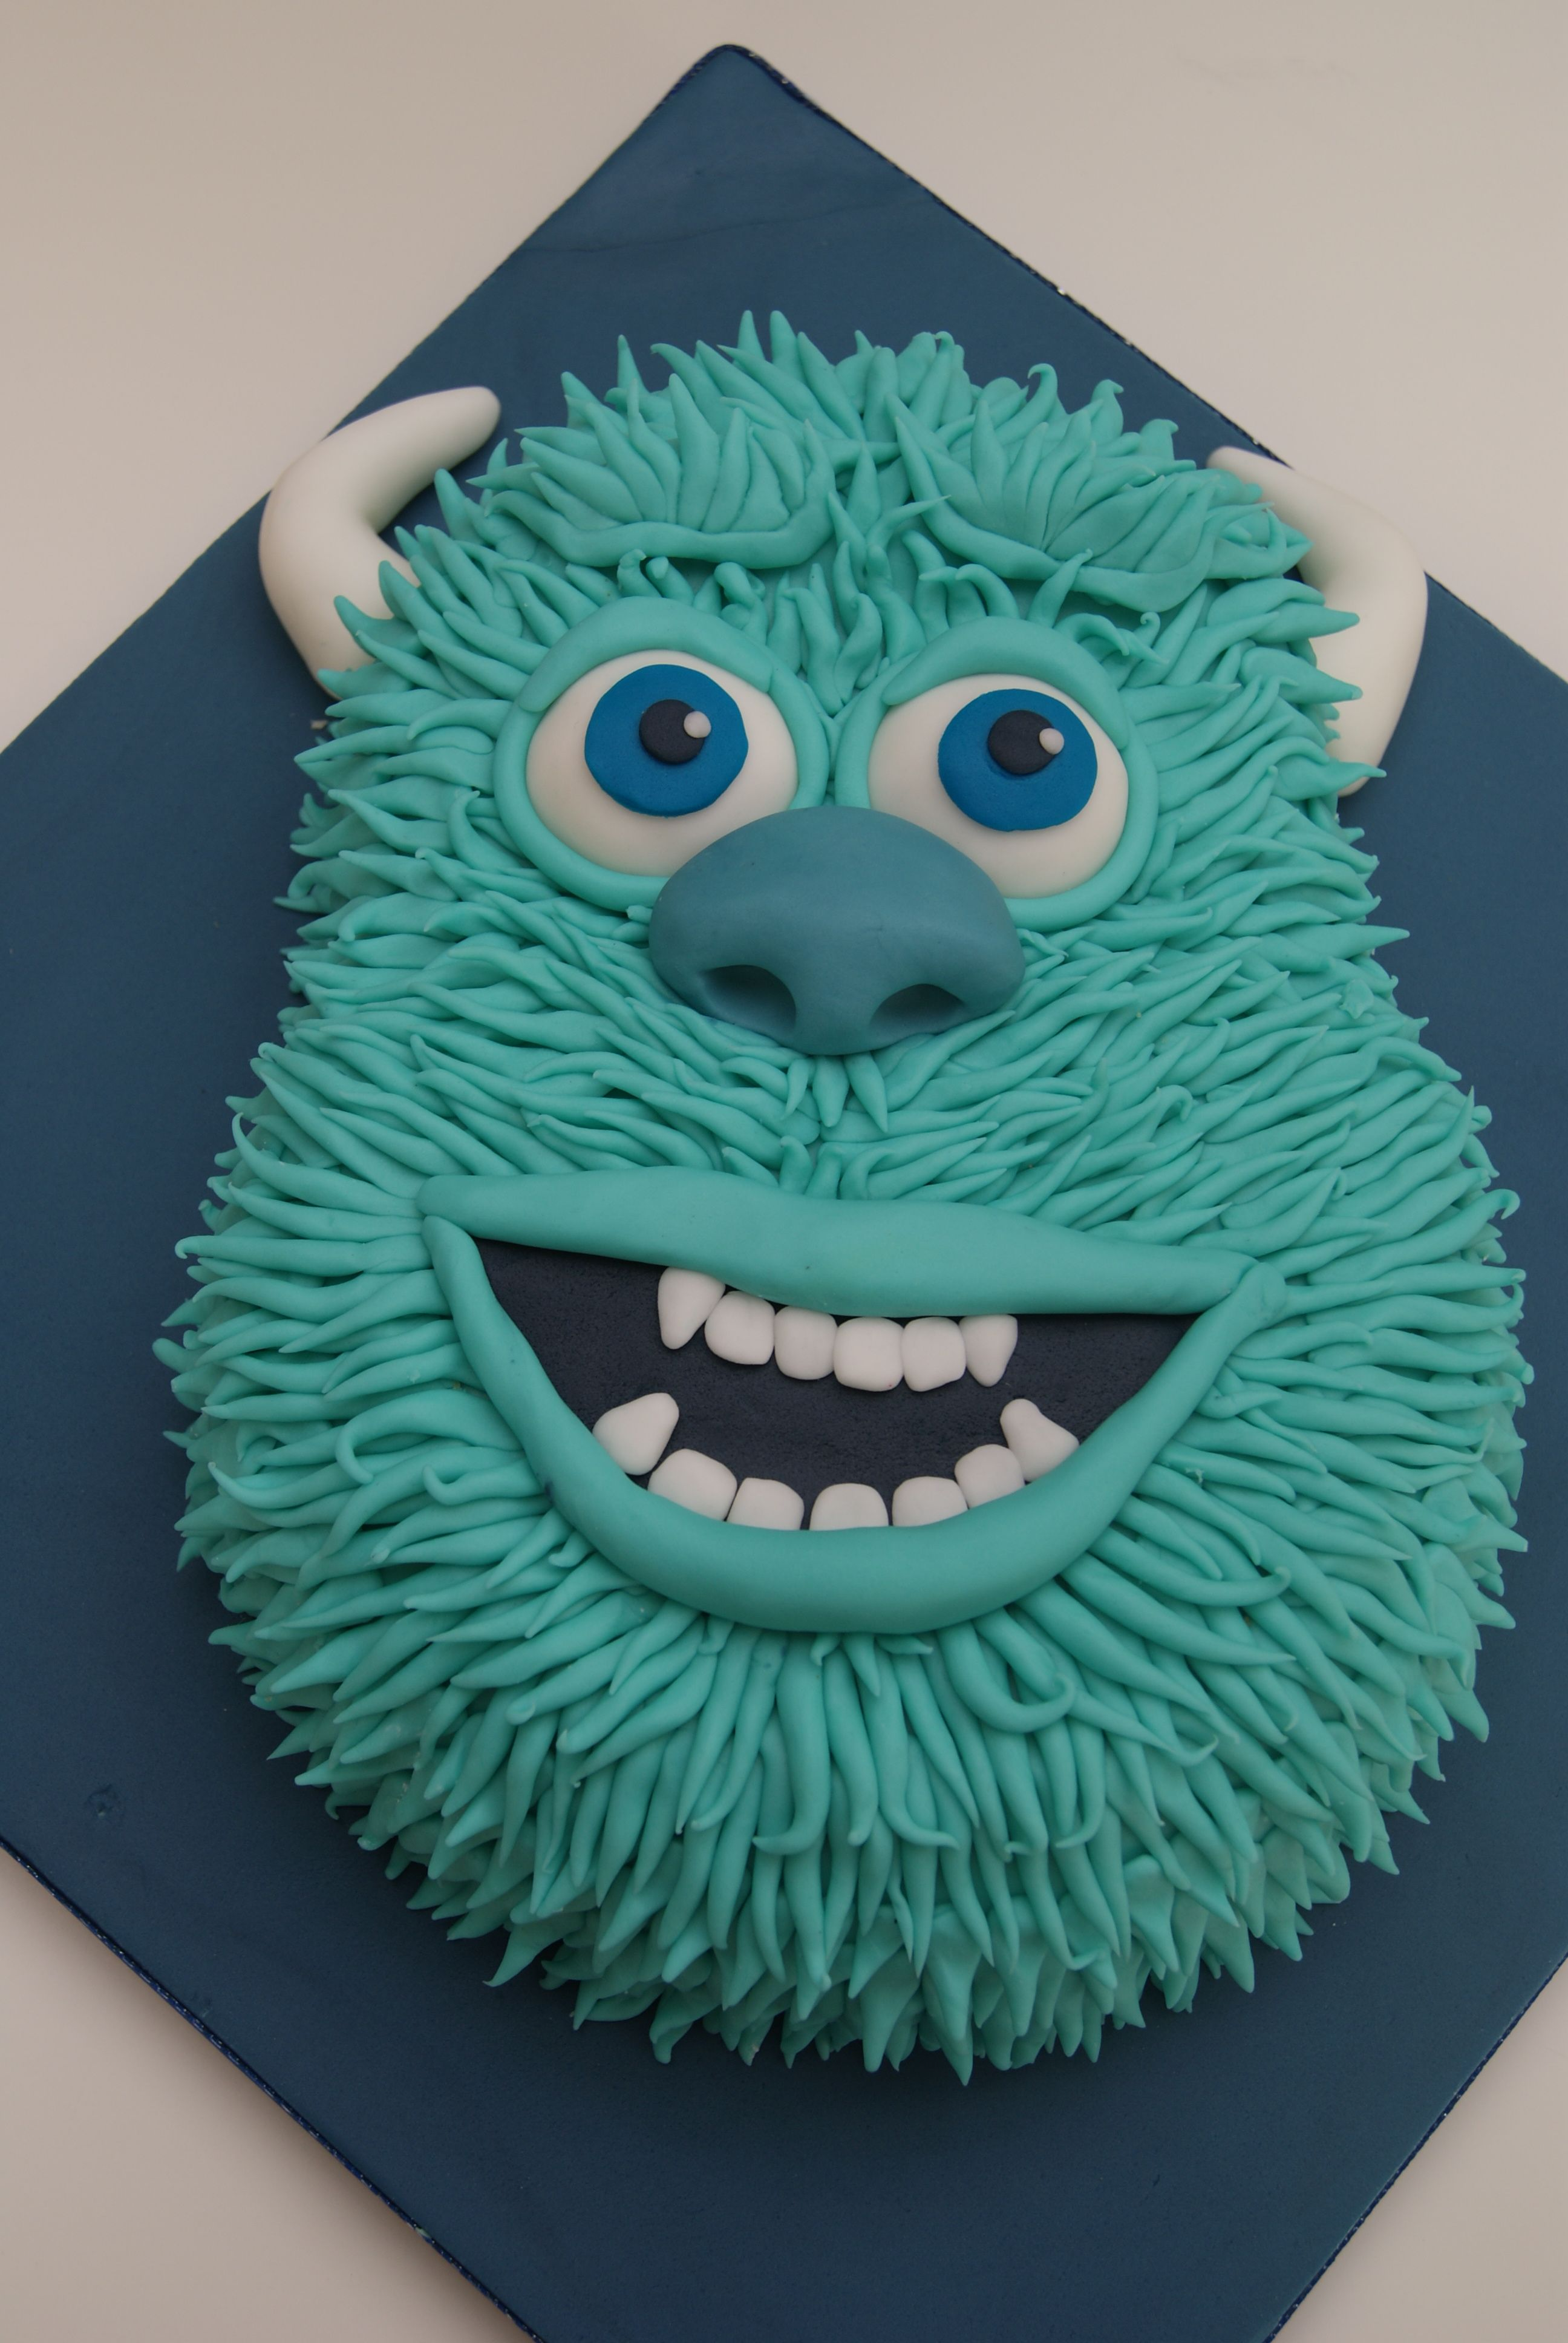 Disney Monster Inc cakes Disney Pixar Monsters Inc James P